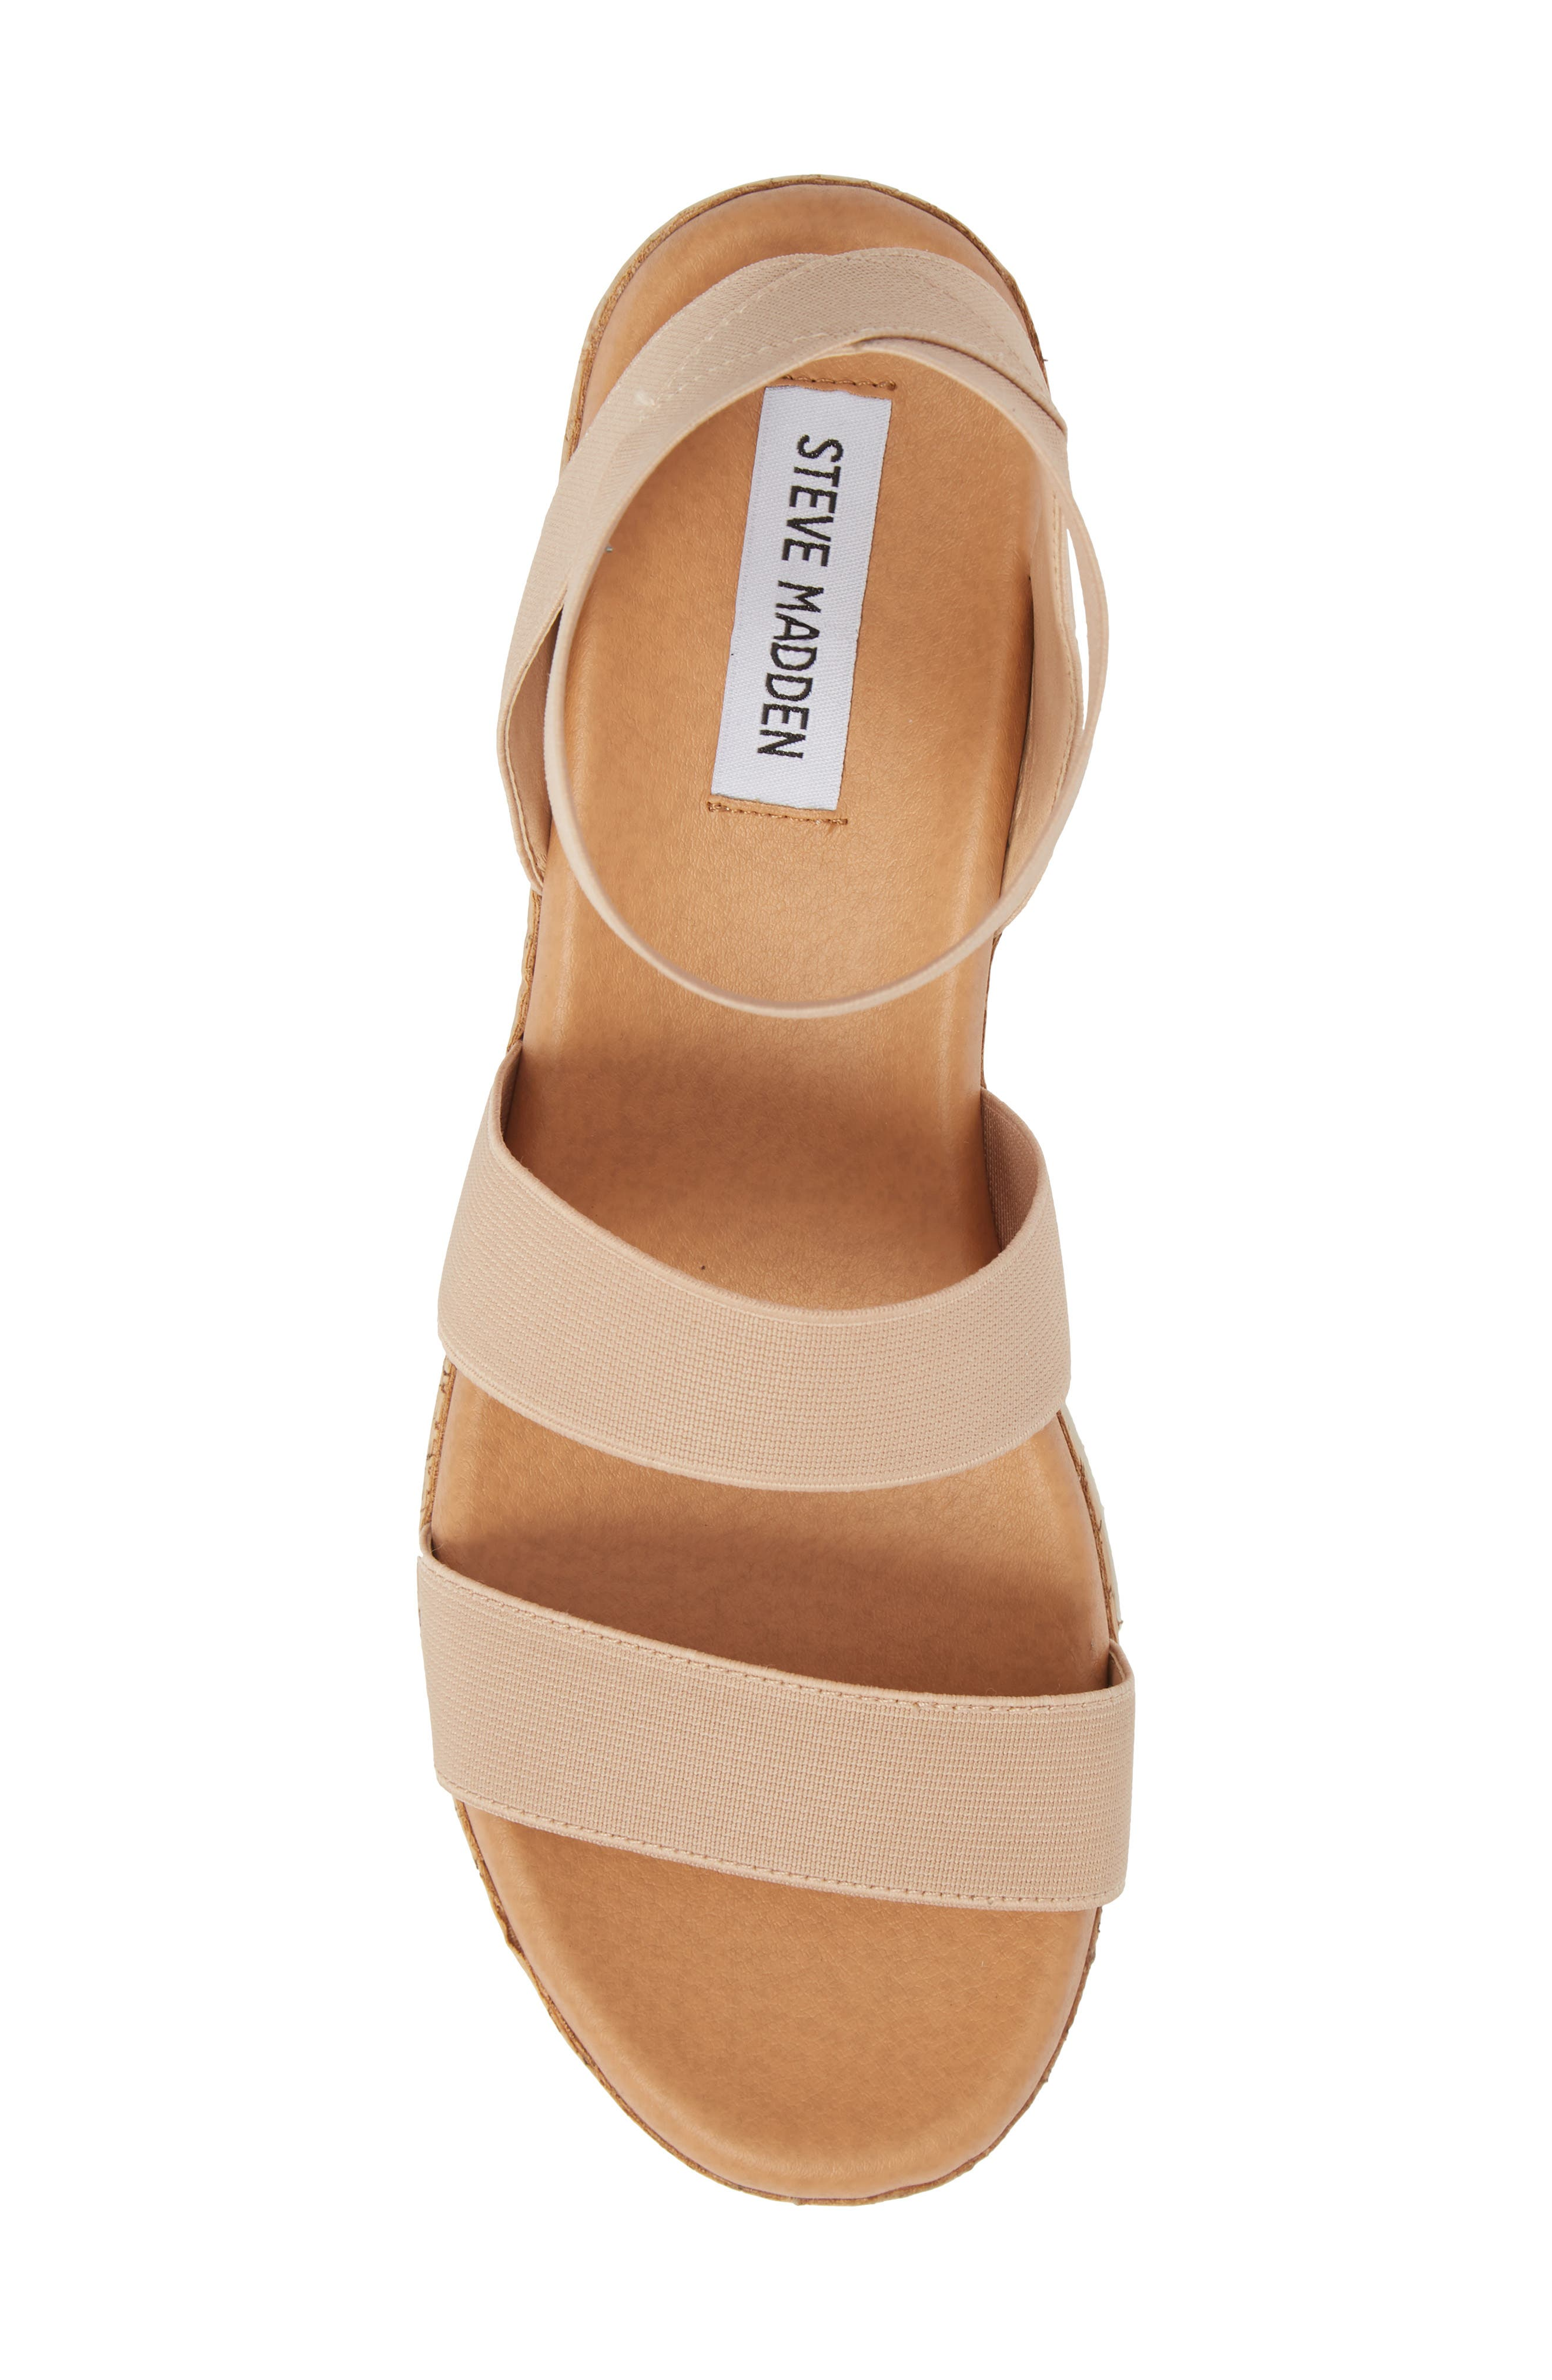 Bandi Platform Wedge Sandal,                             Alternate thumbnail 5, color,                             Blush